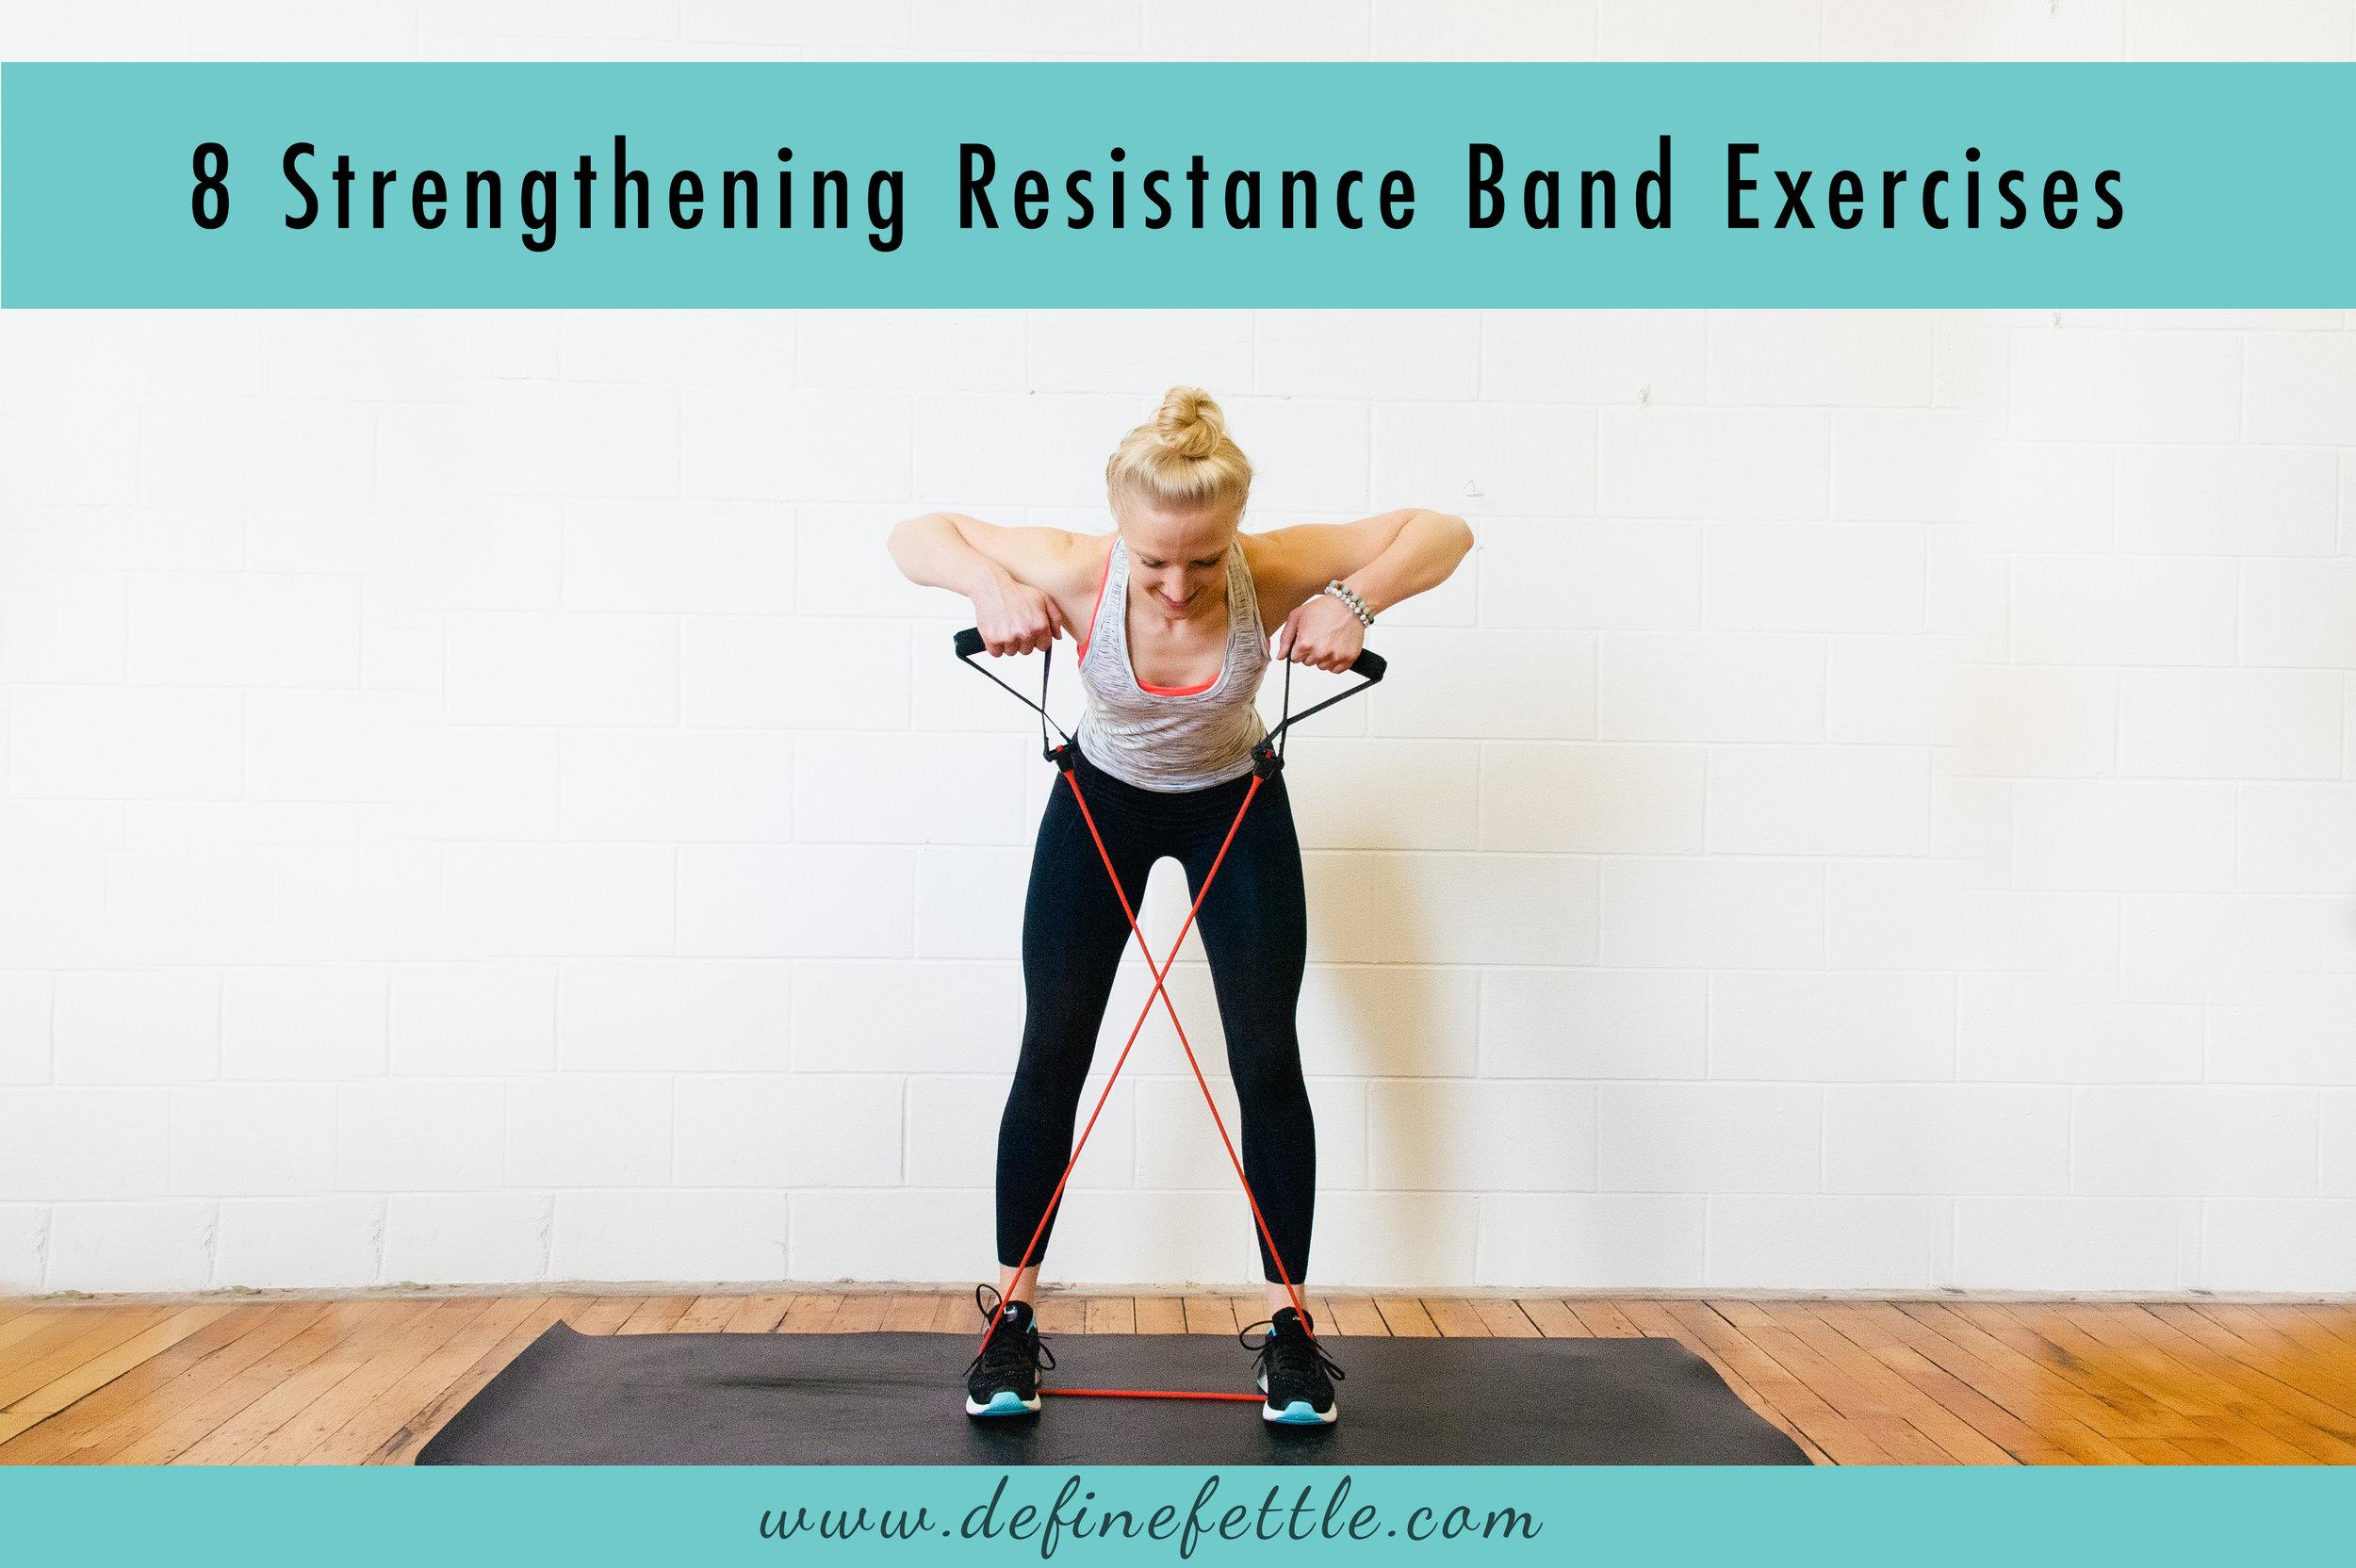 8 Strengthening Resistance Band Exercises Define Fettle